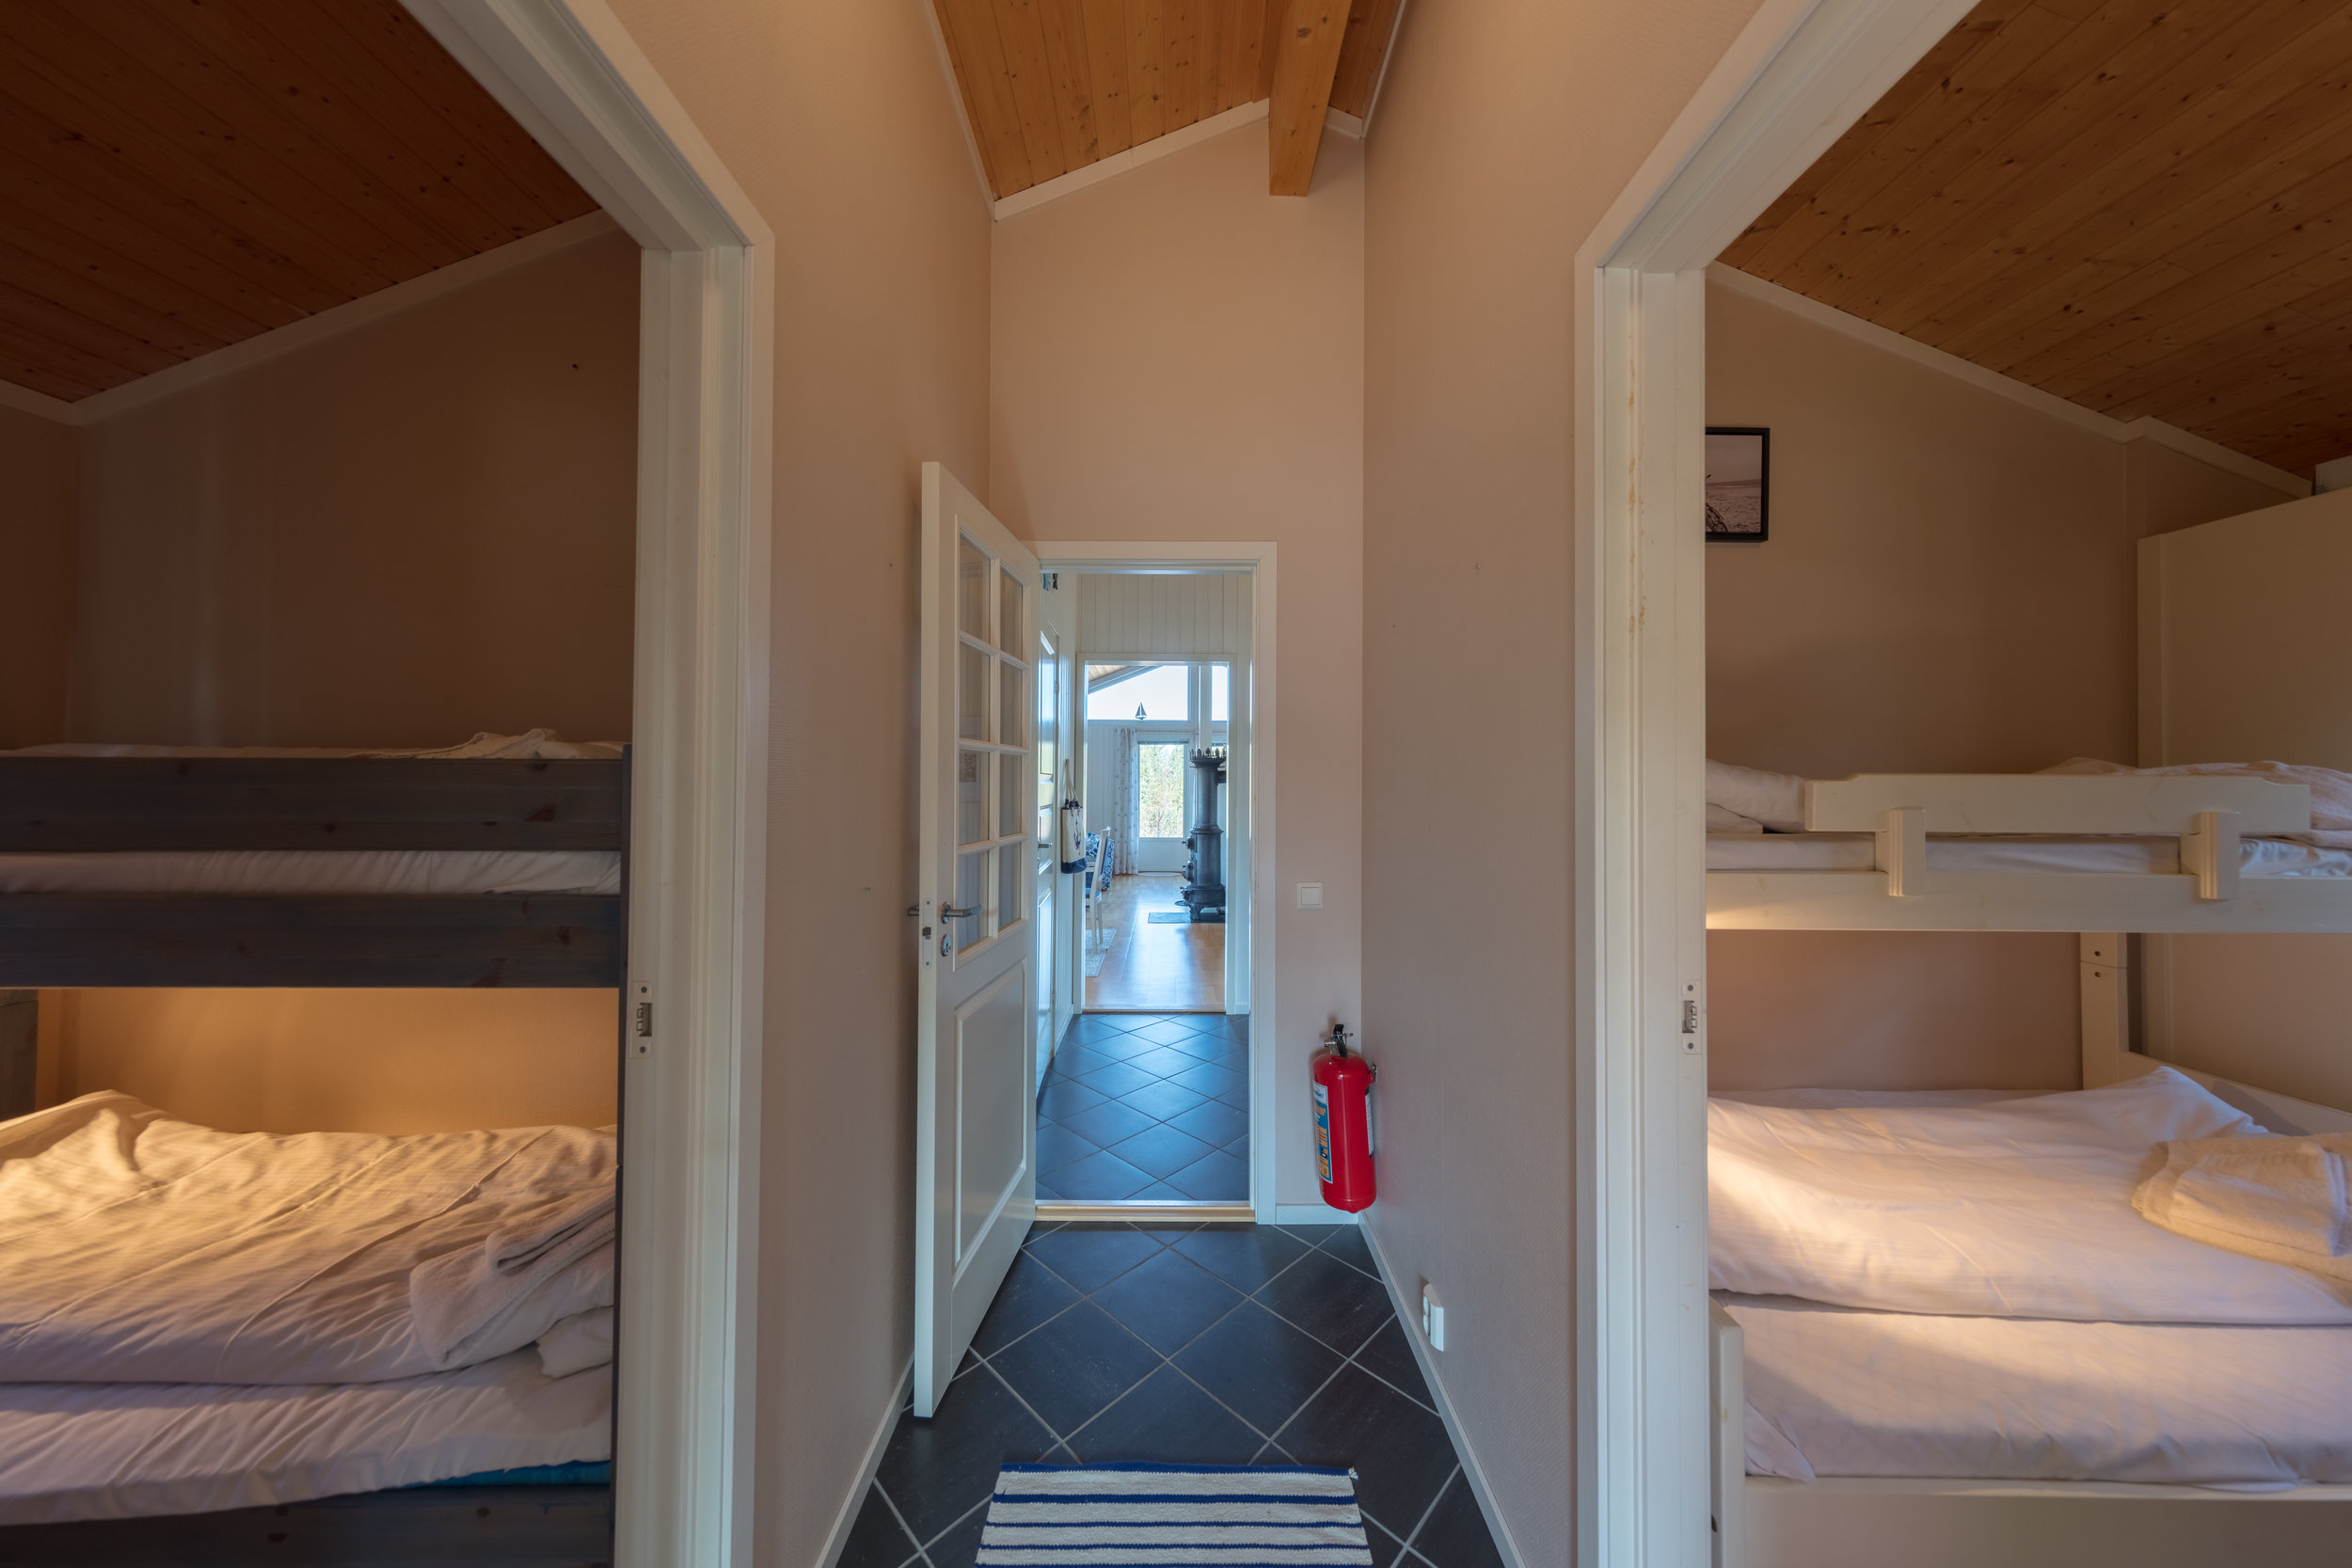 Dolmsundet-hotell-Hitra-Norge-norway-fotoknoff-sven-erik-knoff-high-res---8.jpg